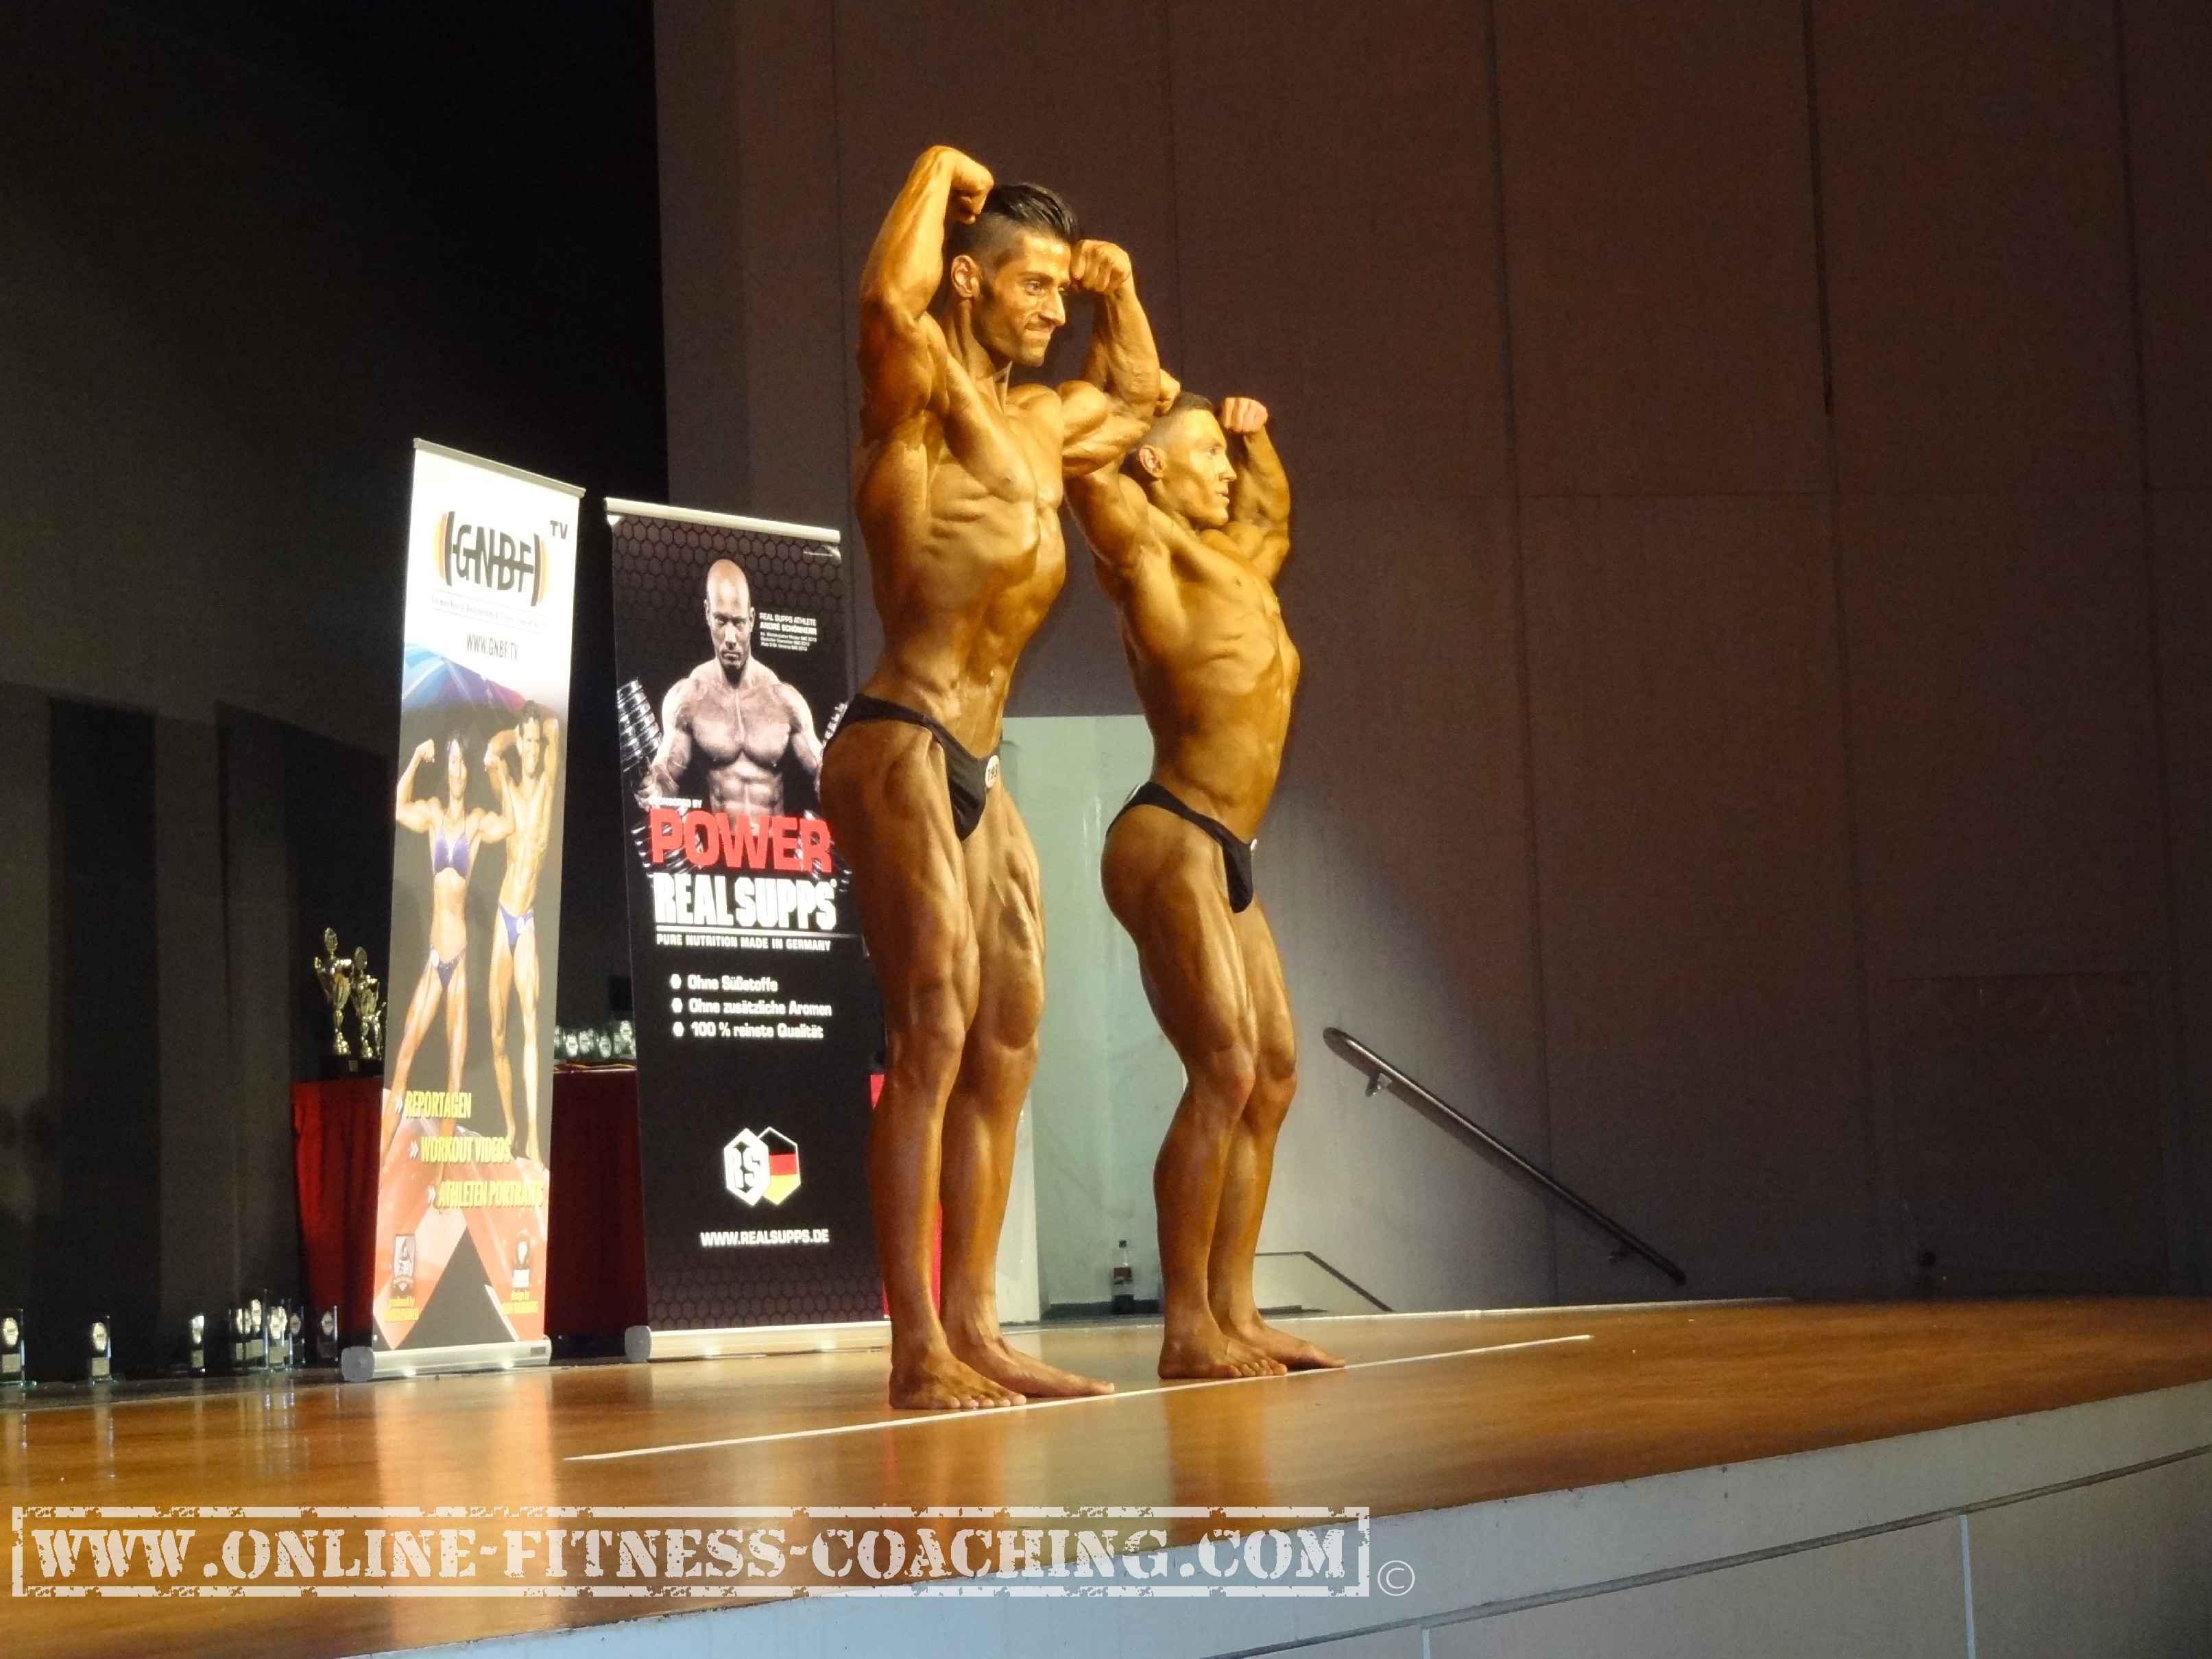 Bahadori_Sepehr_Junioren_Gewinner_Bodybuilding_GNBF_2014_Deutsche_Meisterschaft__2014 576